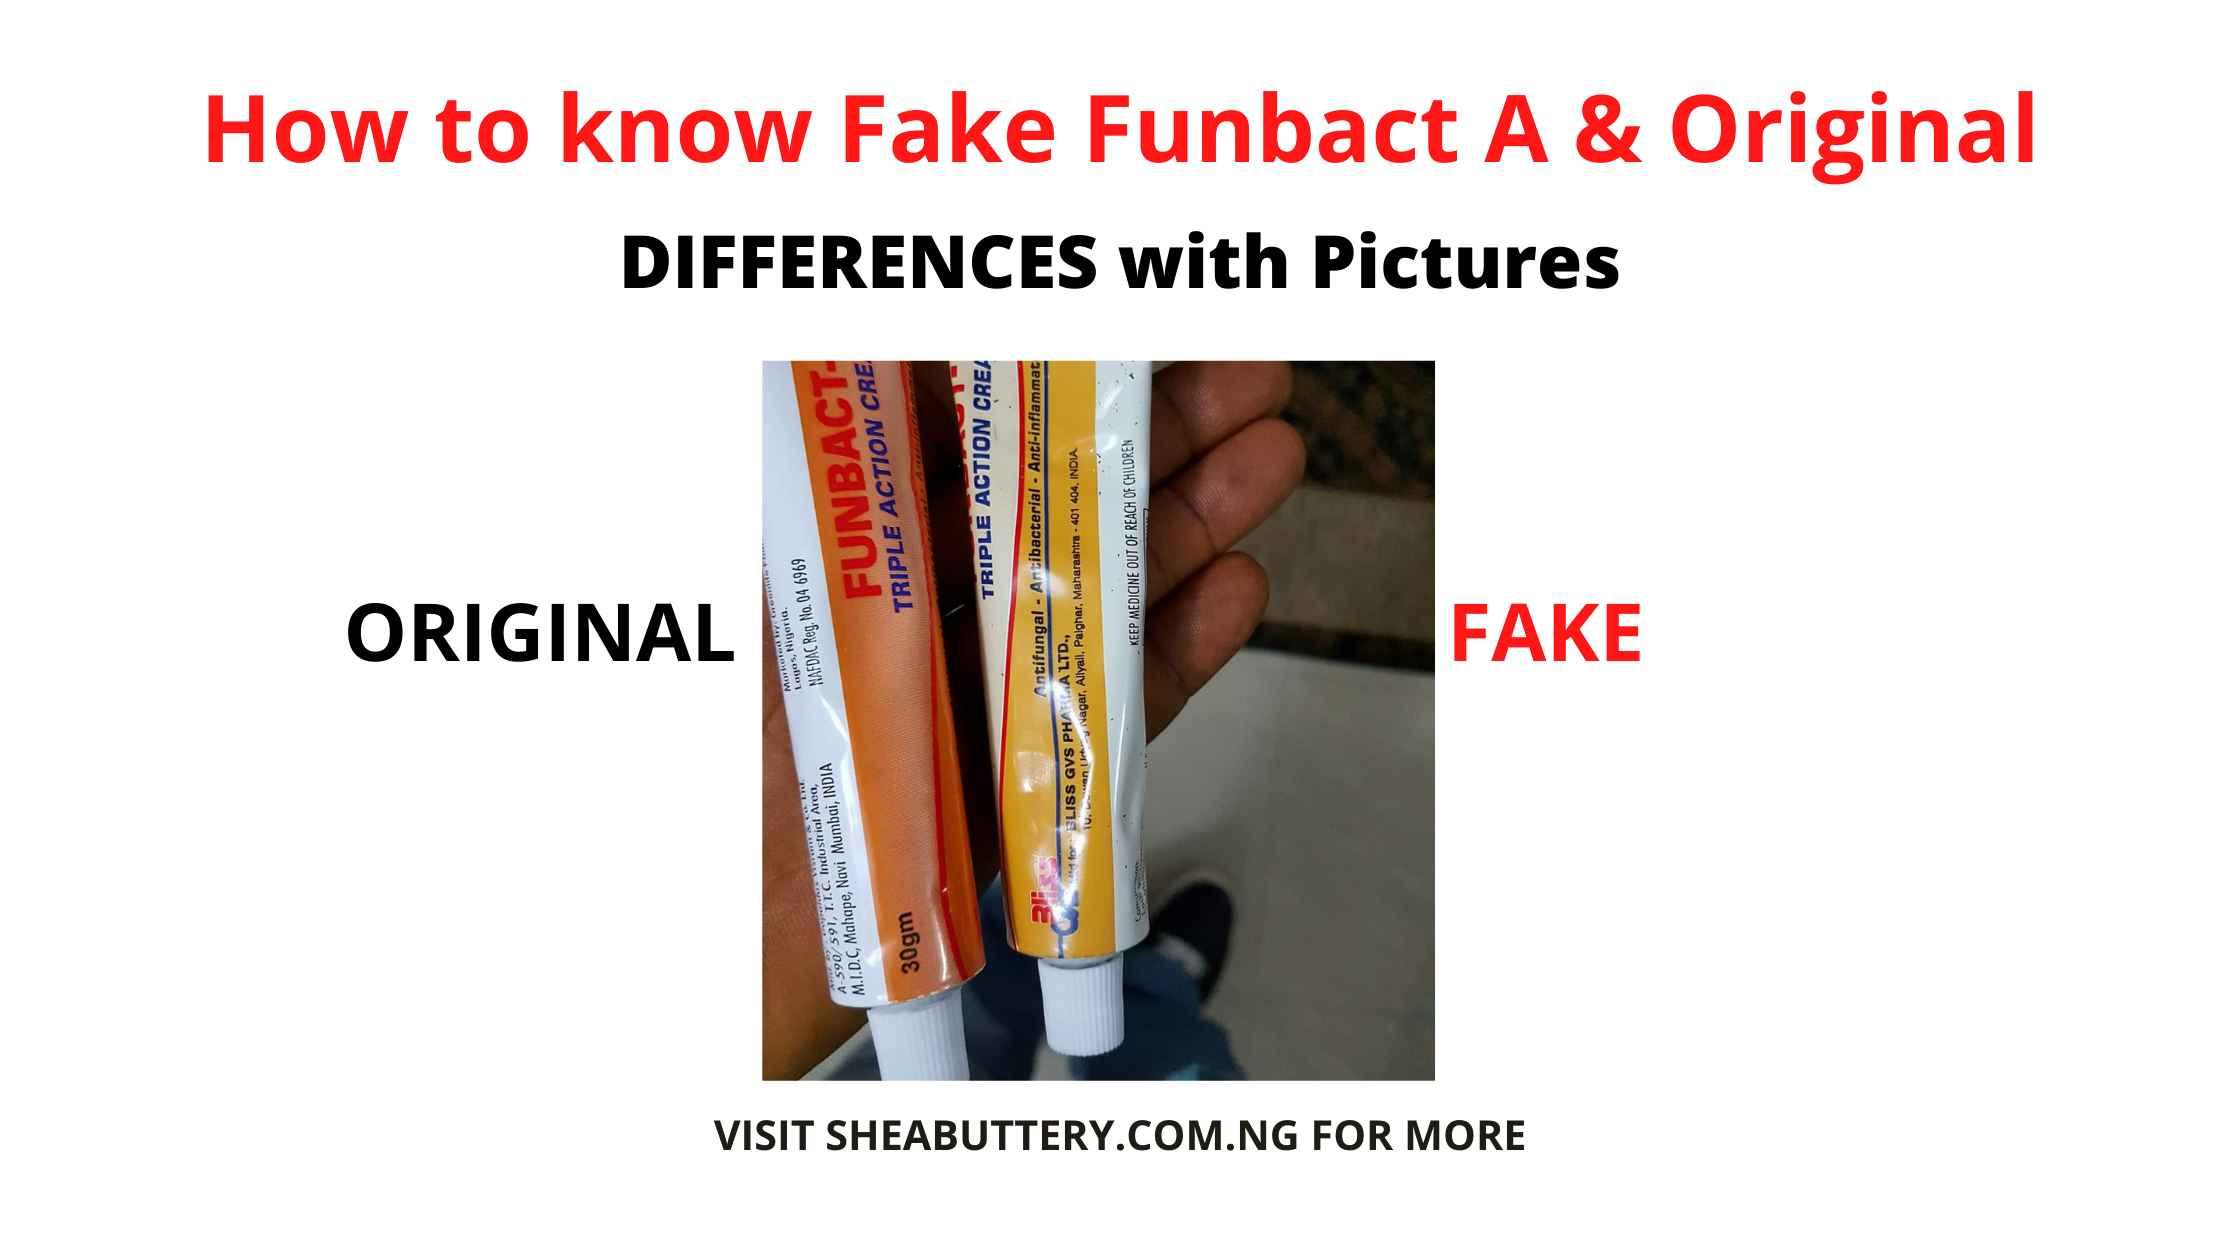 How to know Fake Funbact A & Original